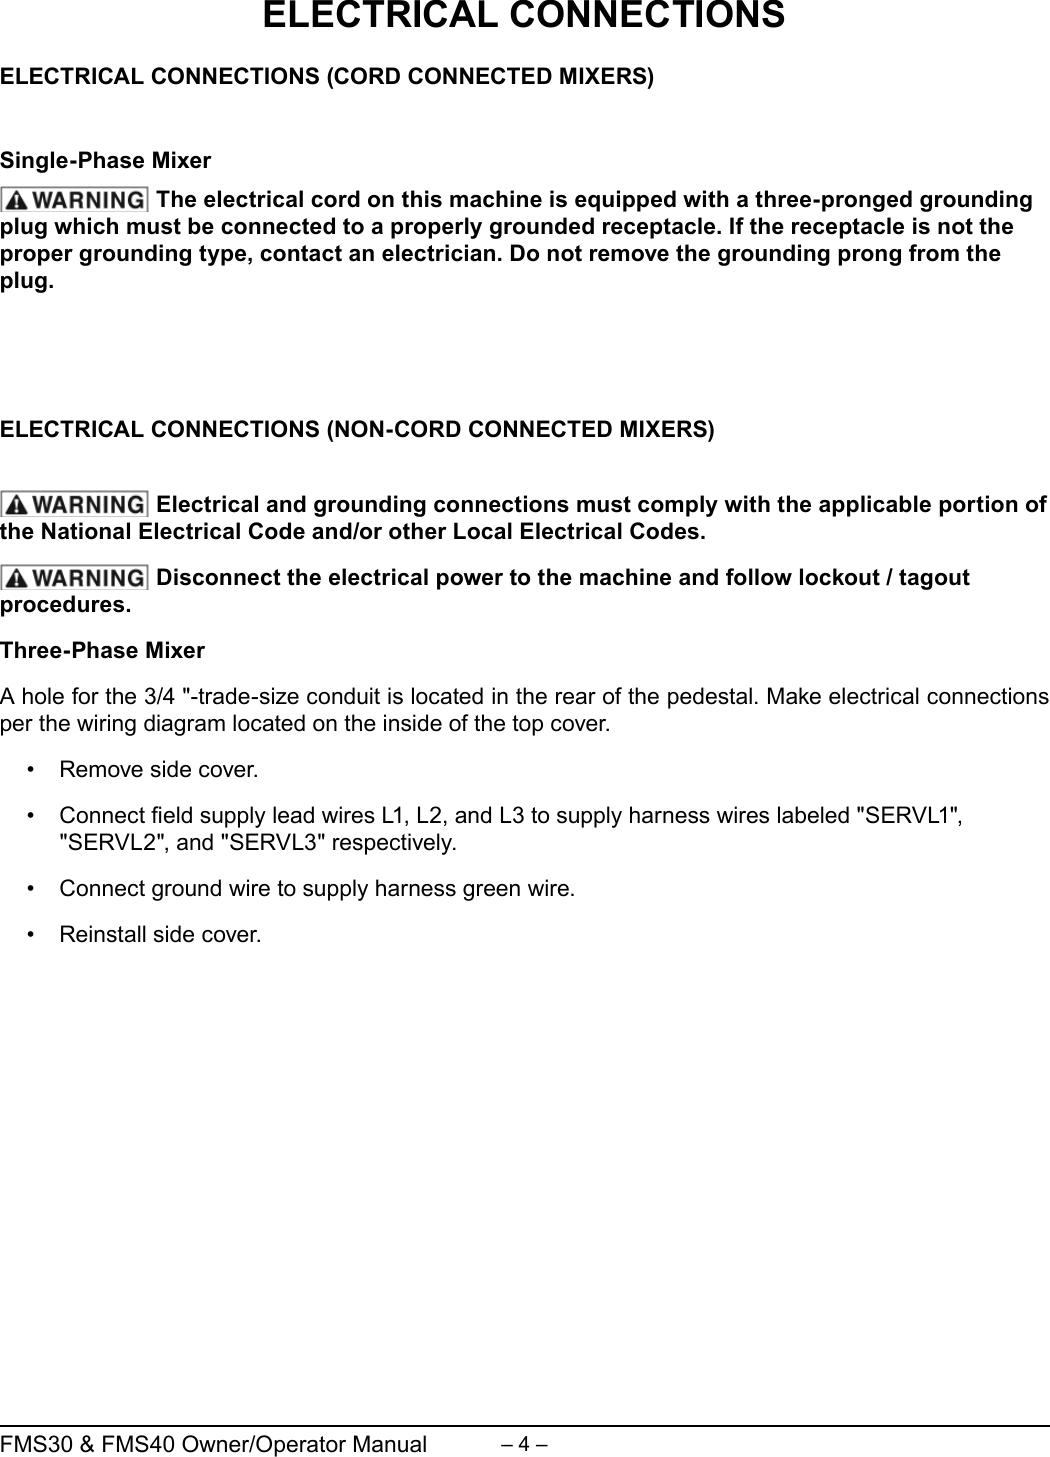 Berkel Fms40 Users Manual Dough Mixer Wiring Diagram Page 4 Of 12